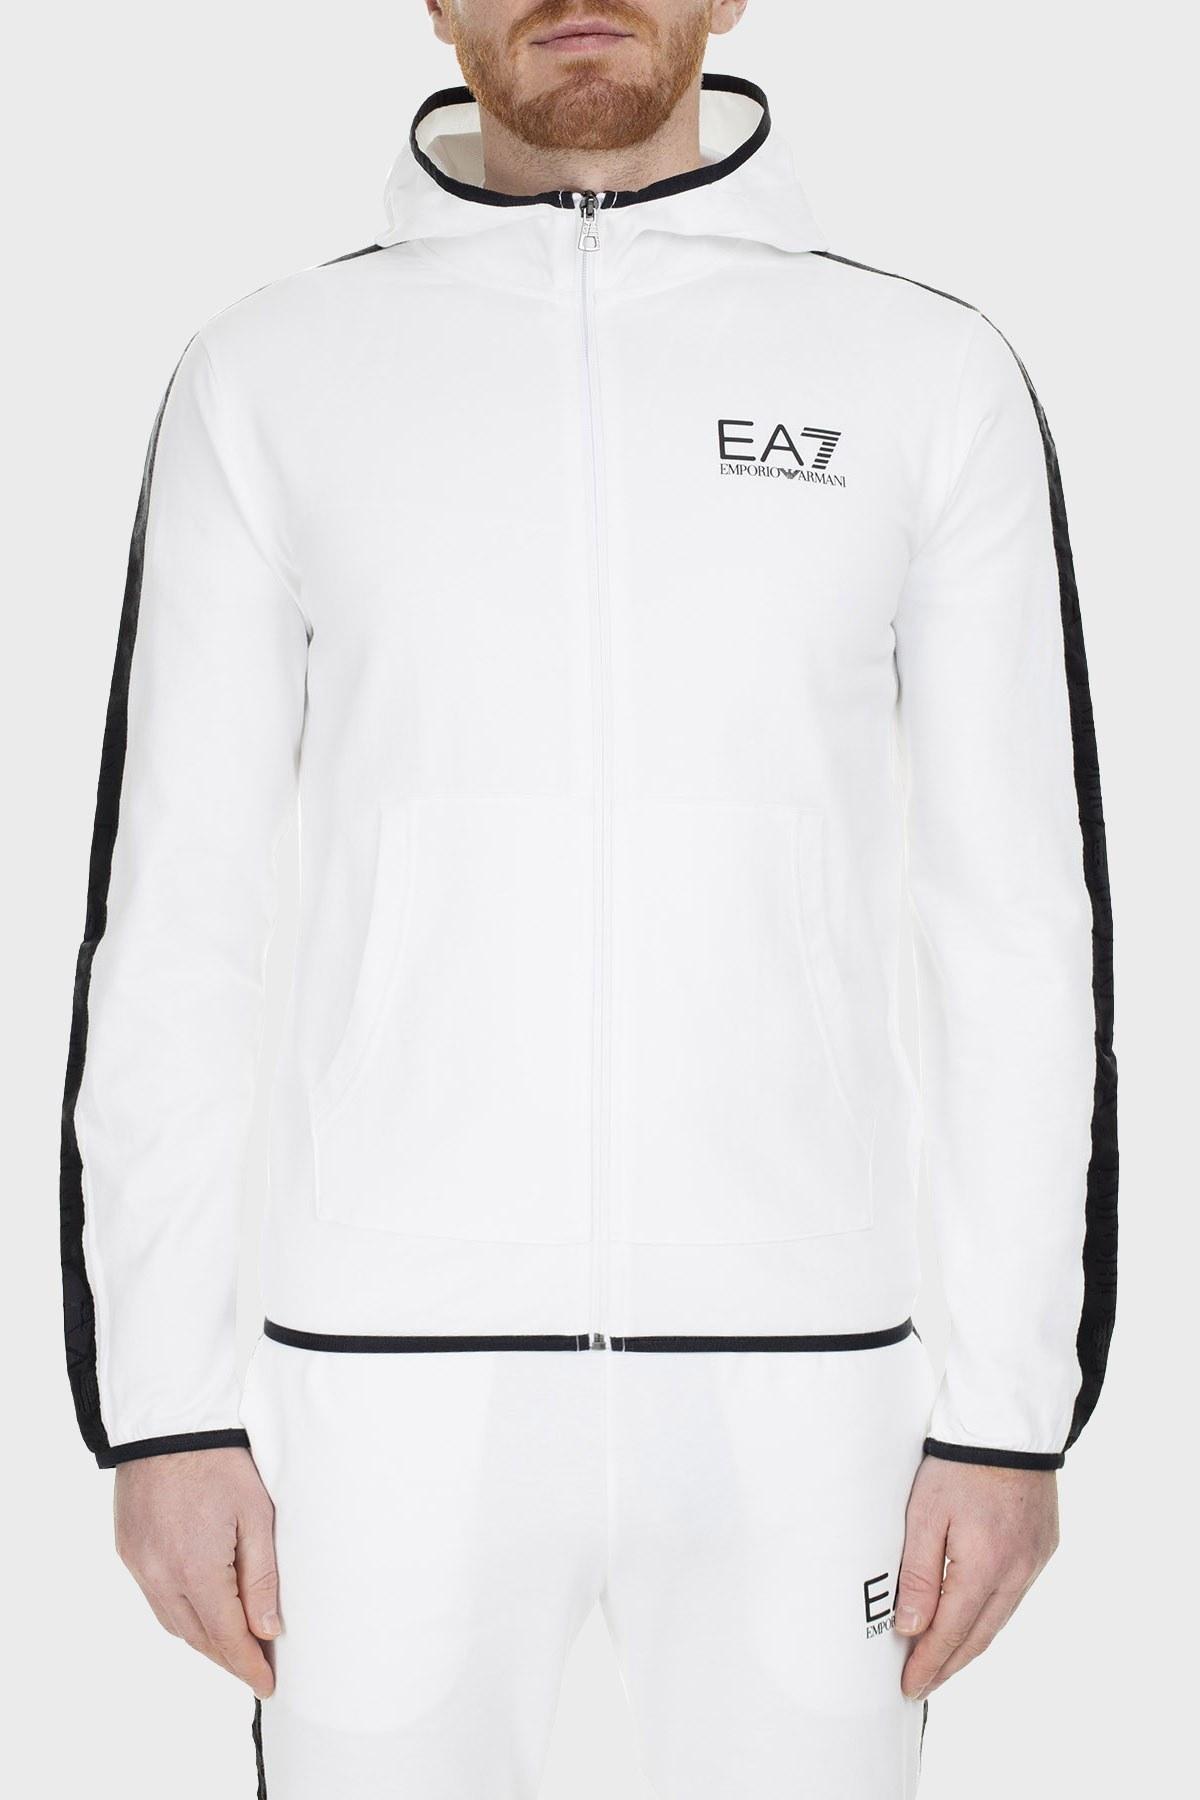 EA7 Erkek Sweat S 3GPM22 PJ05Z 1100 BEYAZ